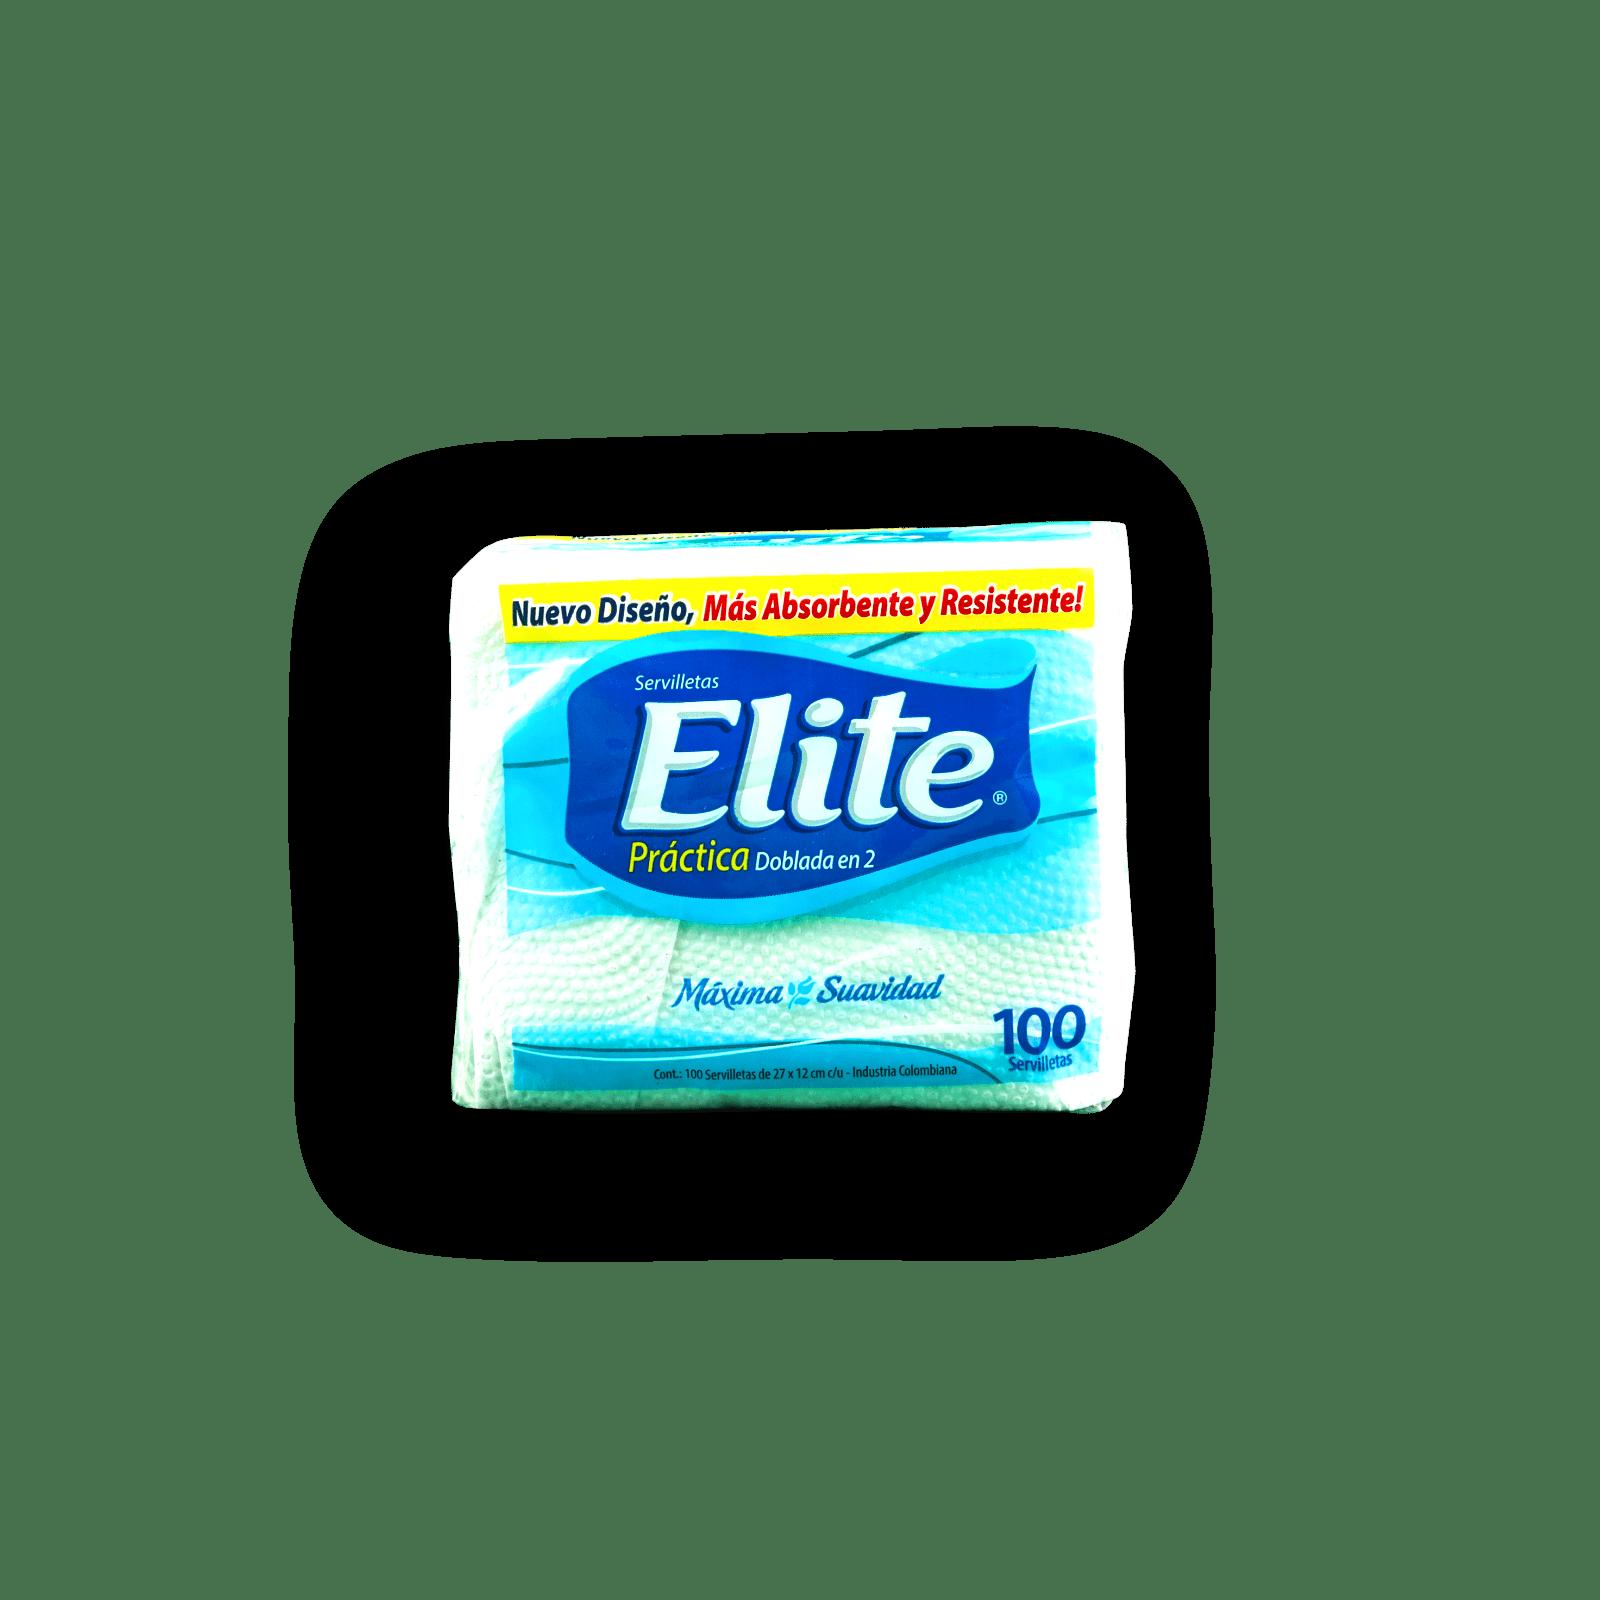 Servilleta Elite Doblada En Dos